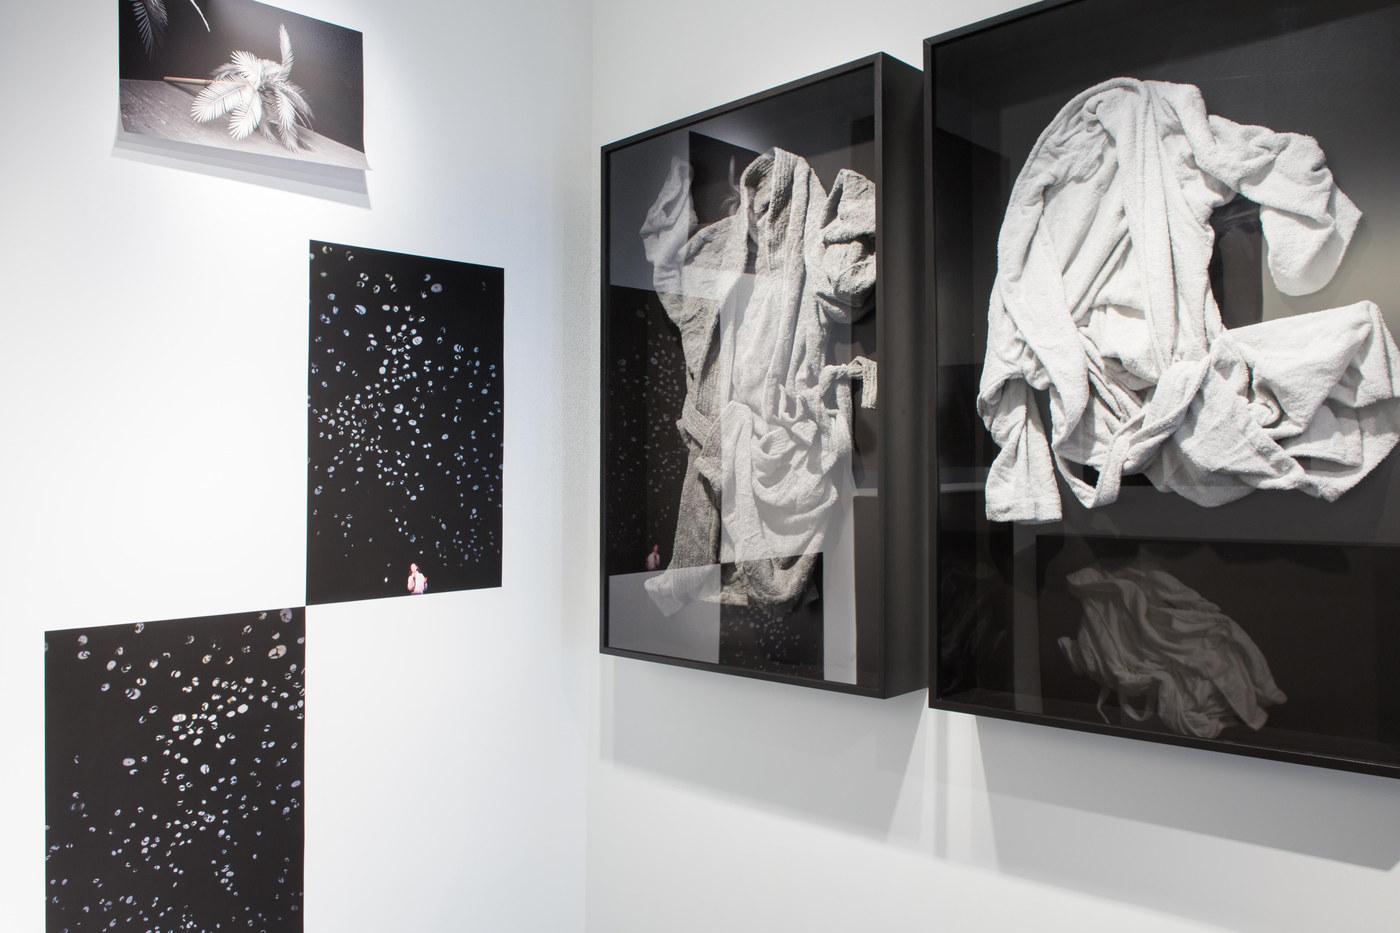 SARAH-ORTMEYER-KUNSTHALLE-BADEN-BADEN-MOMA-PS1-NY-BELVEDERE-VIENNA-18